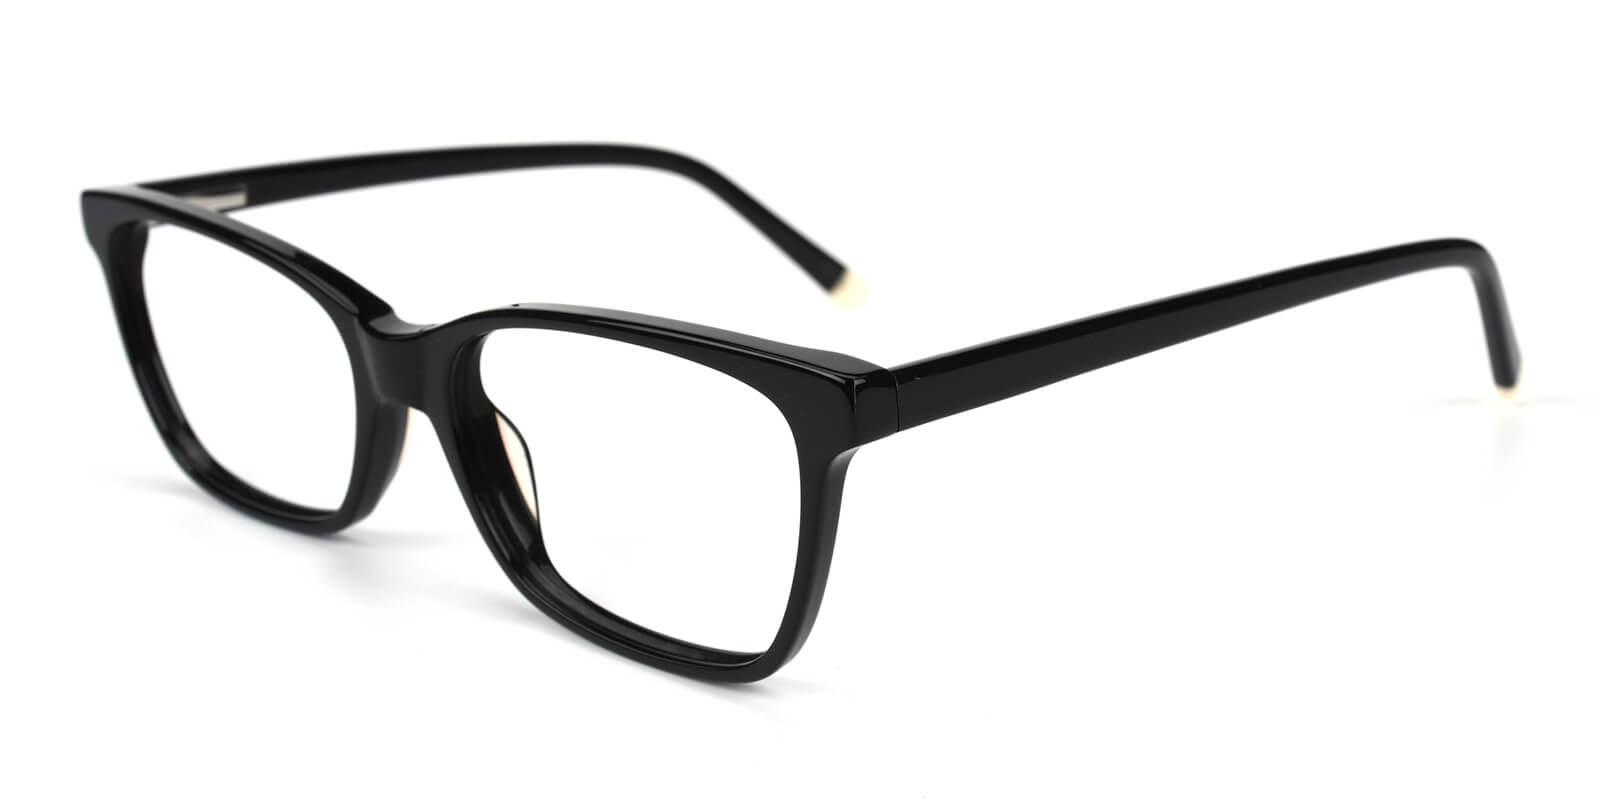 Waferay-Black-Cat-Acetate-Eyeglasses-additional1